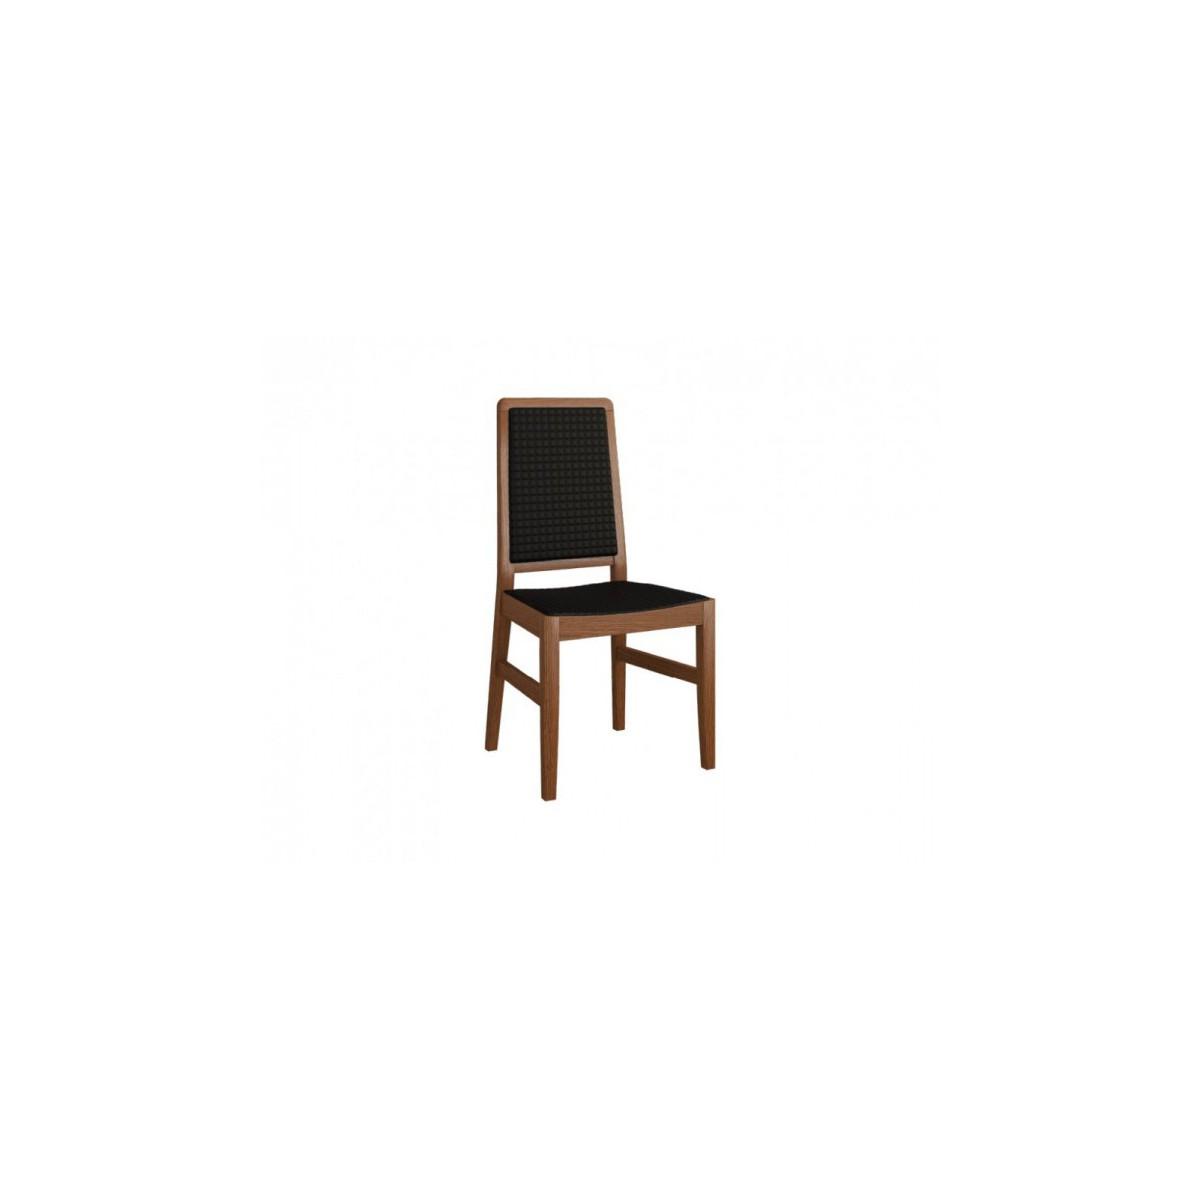 Verano Krzesło